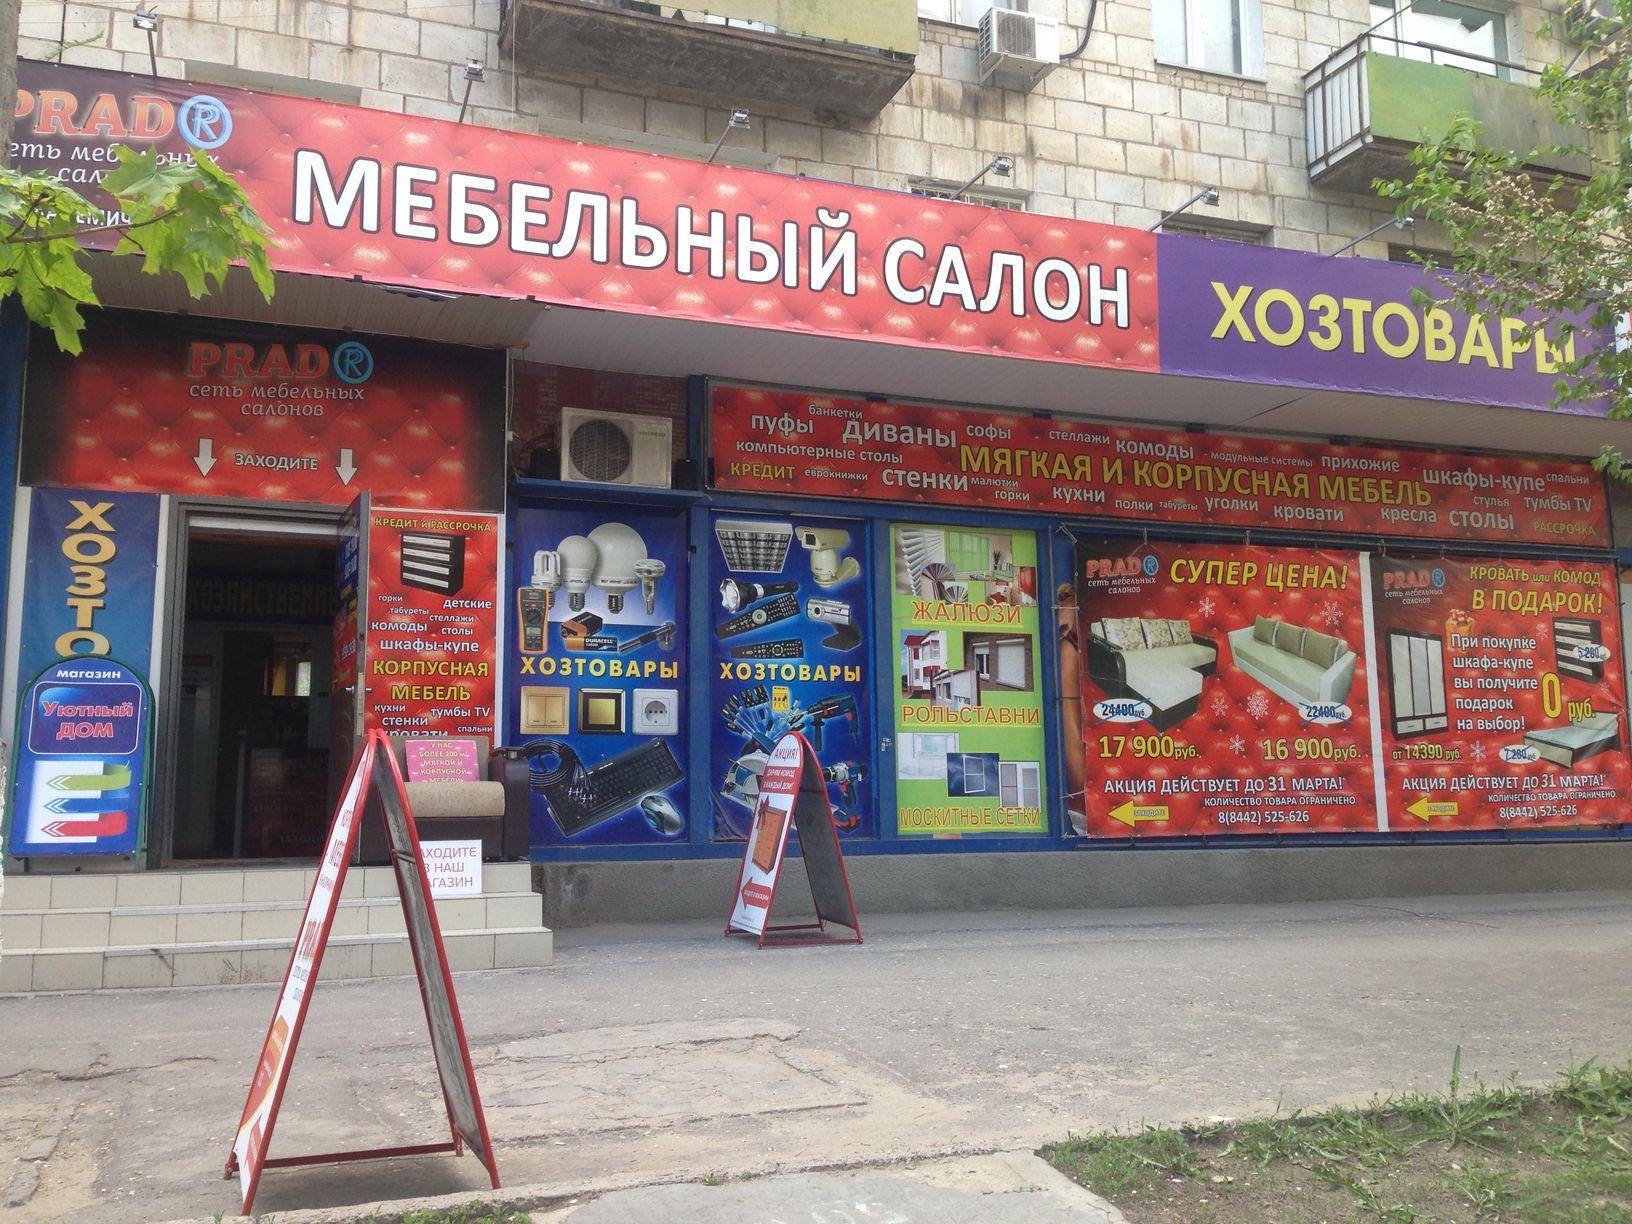 Фасад салона ПРАДО на Академической, 11